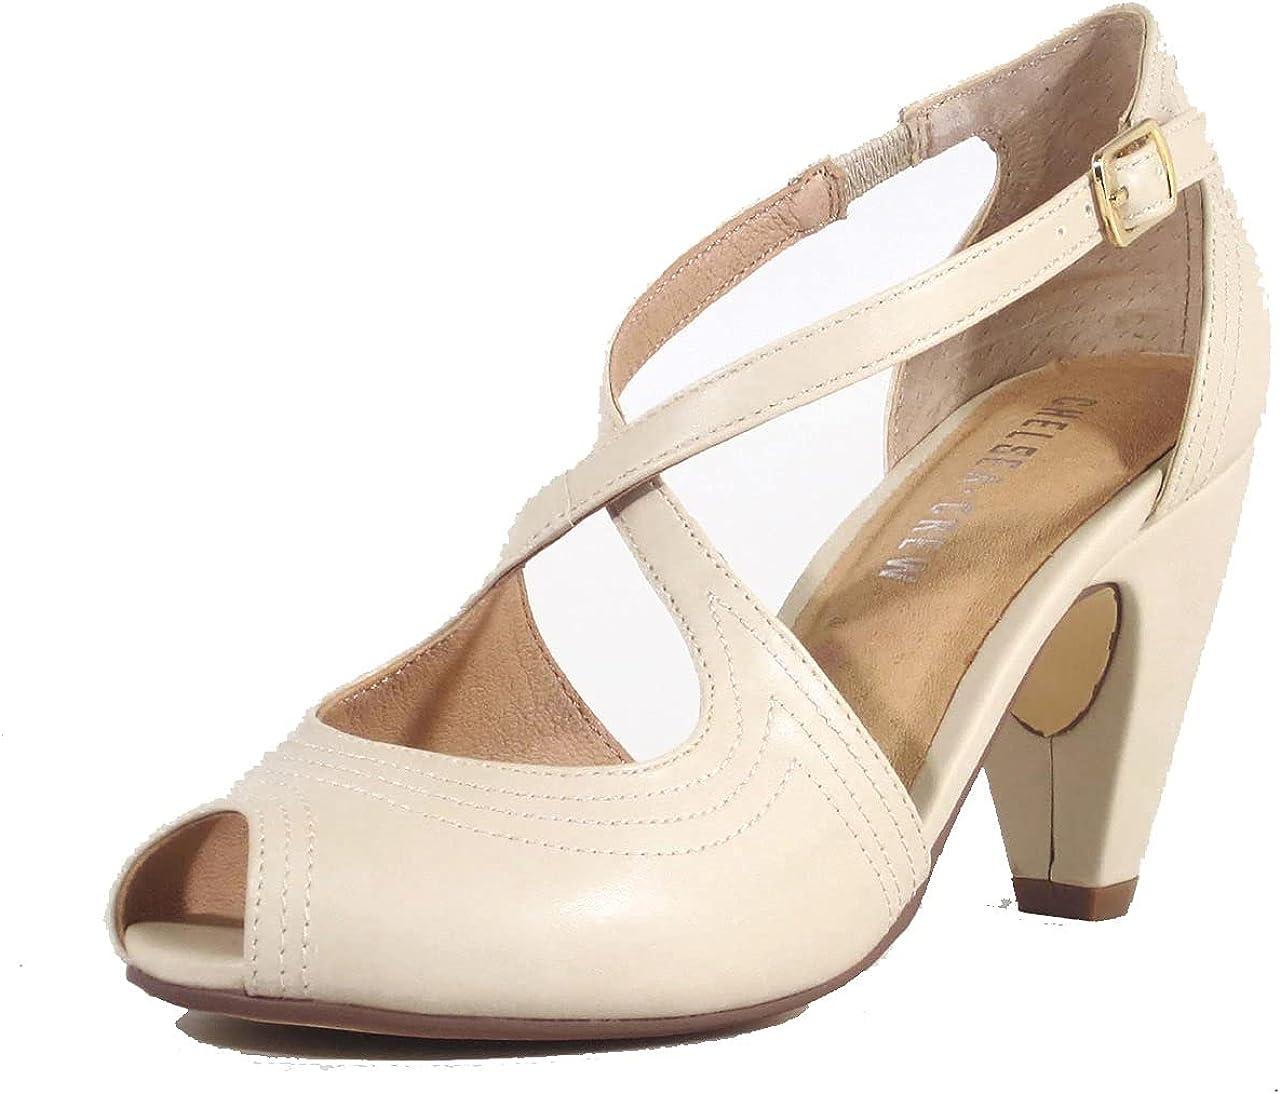 1950s Style Clothing & Fashion Chelsea Crew Natasha Womens Heels  AT vintagedancer.com